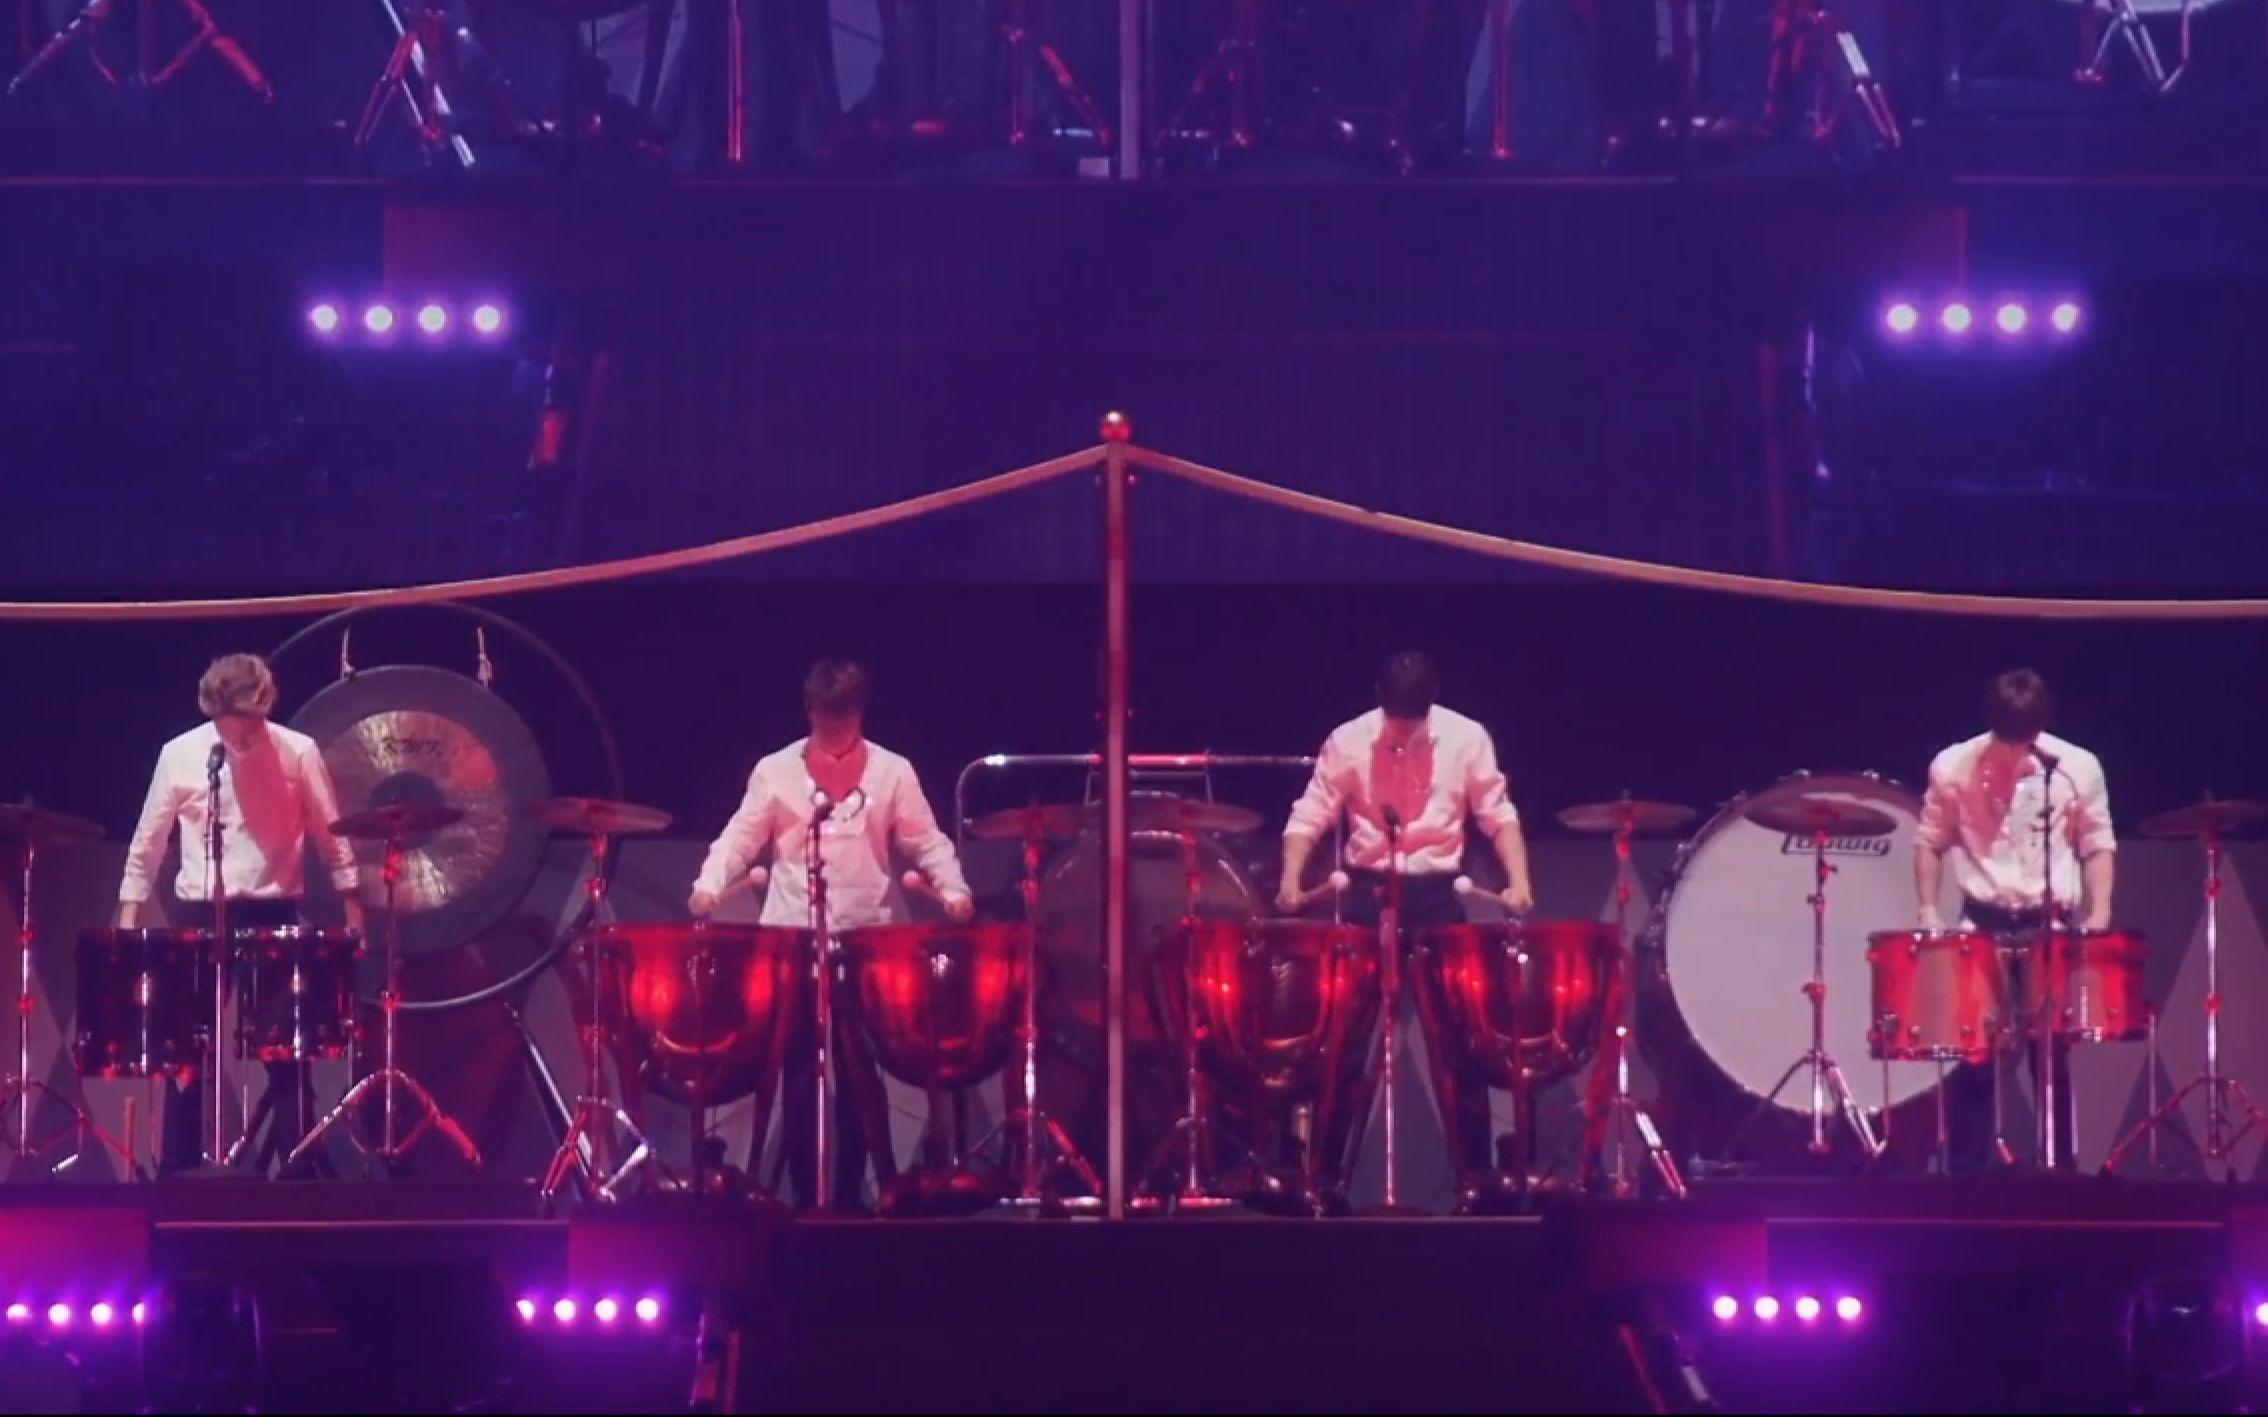 cnblue天天向上视频_【FNC Kingdom】FNC家族演唱会鼓手line开场_哔哩哔哩 (゜-゜)つロ 干 ...